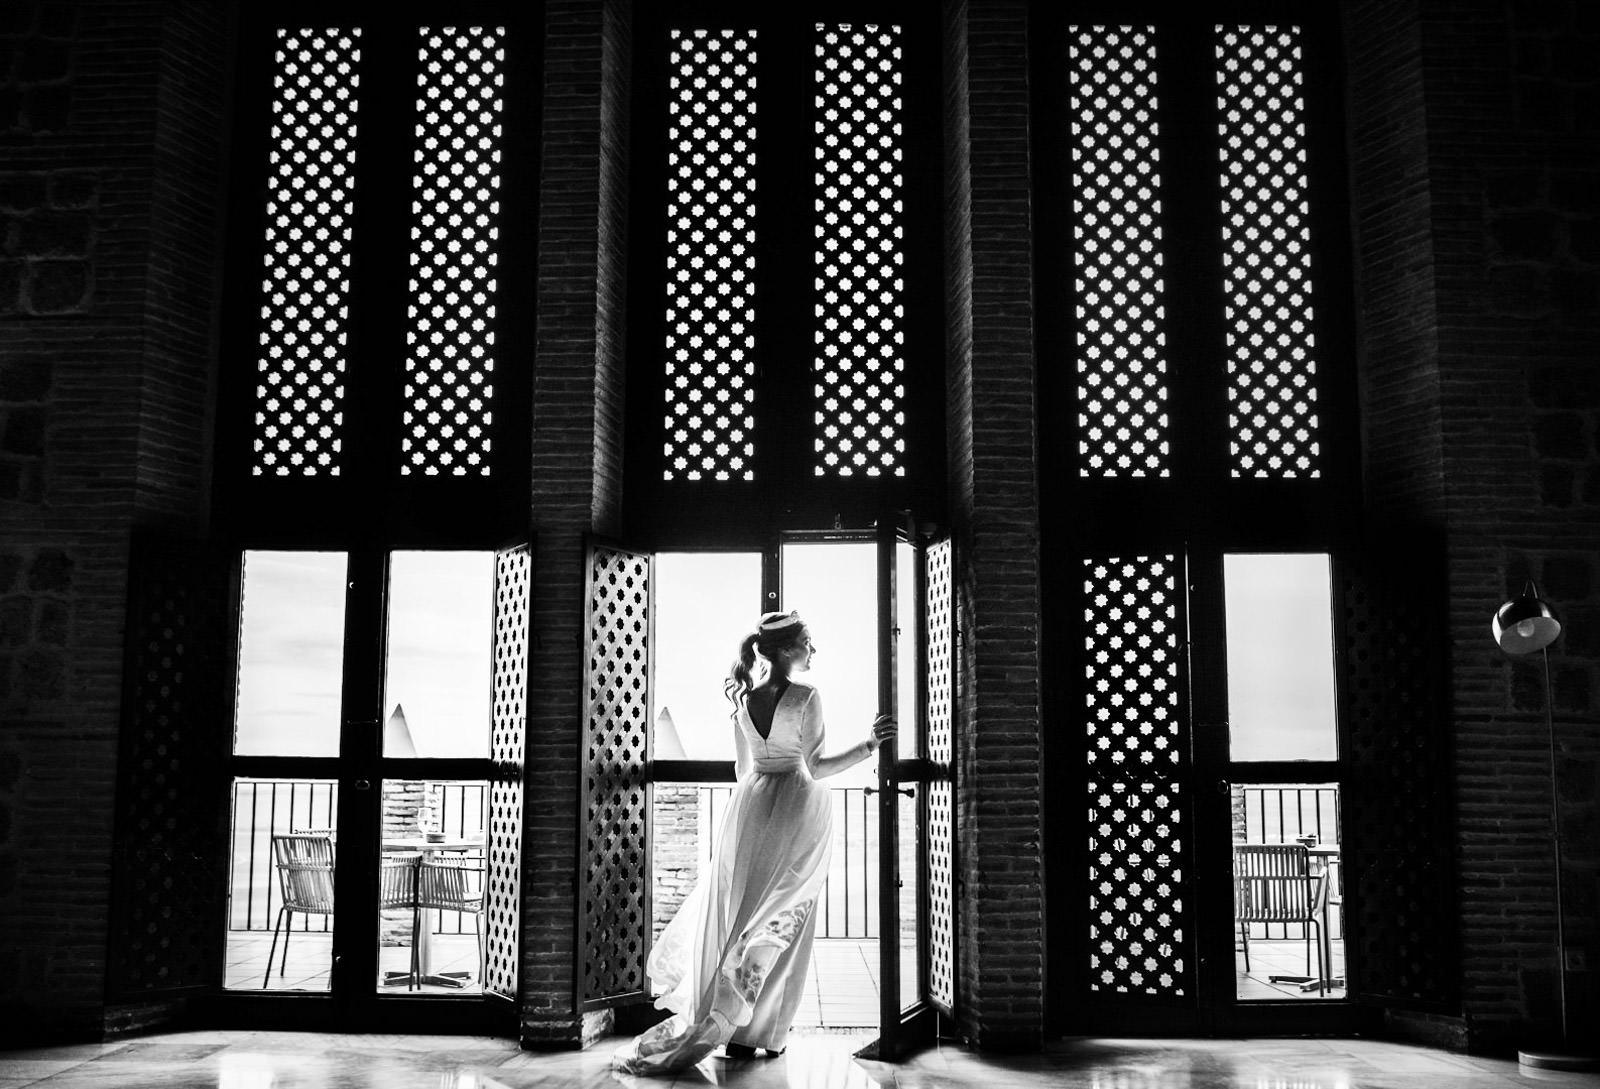 Boda-Sevilla-Parador-Carmona-bridal-engagement-Rafael-Torres-fotografo-bodas-sevilla-madrid-barcelona-wedding-photographer--57.jpg